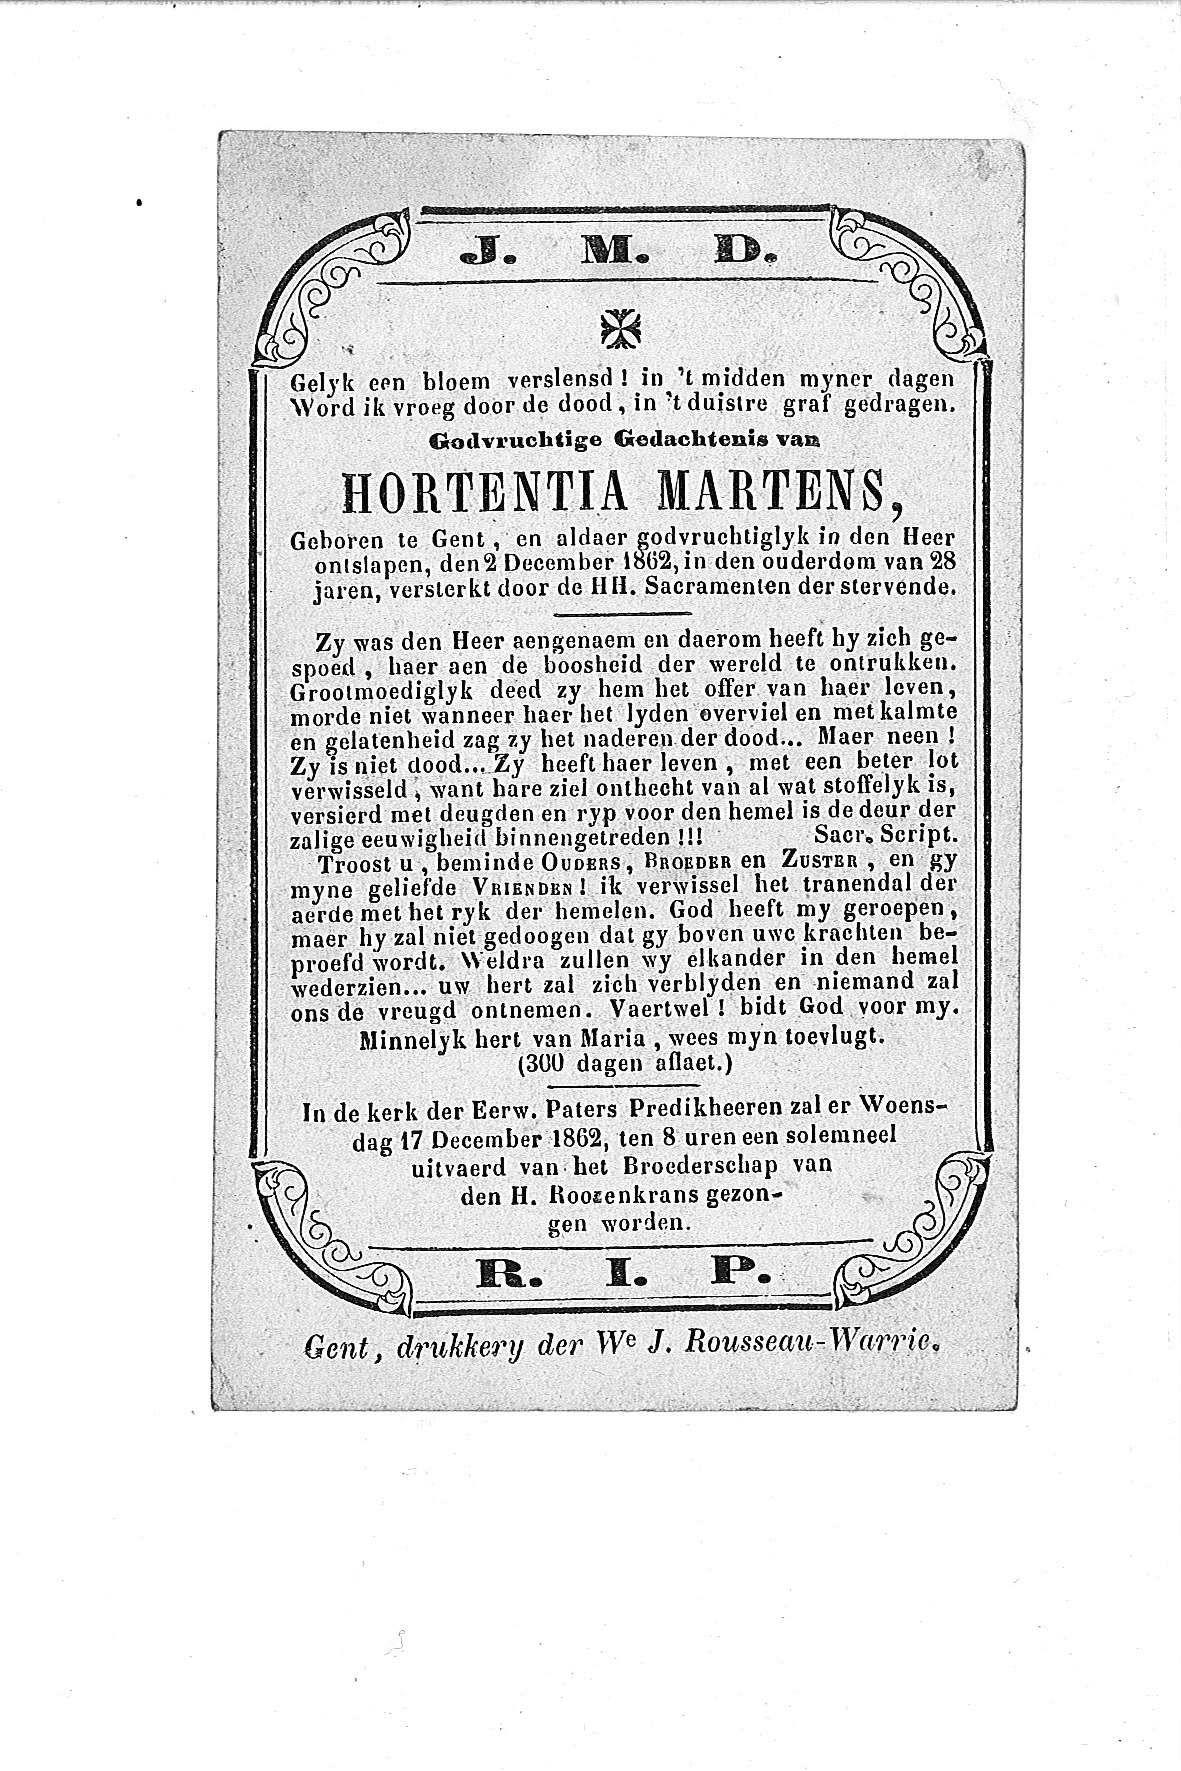 Hortentia(1862)20100128134454_00042.jpg